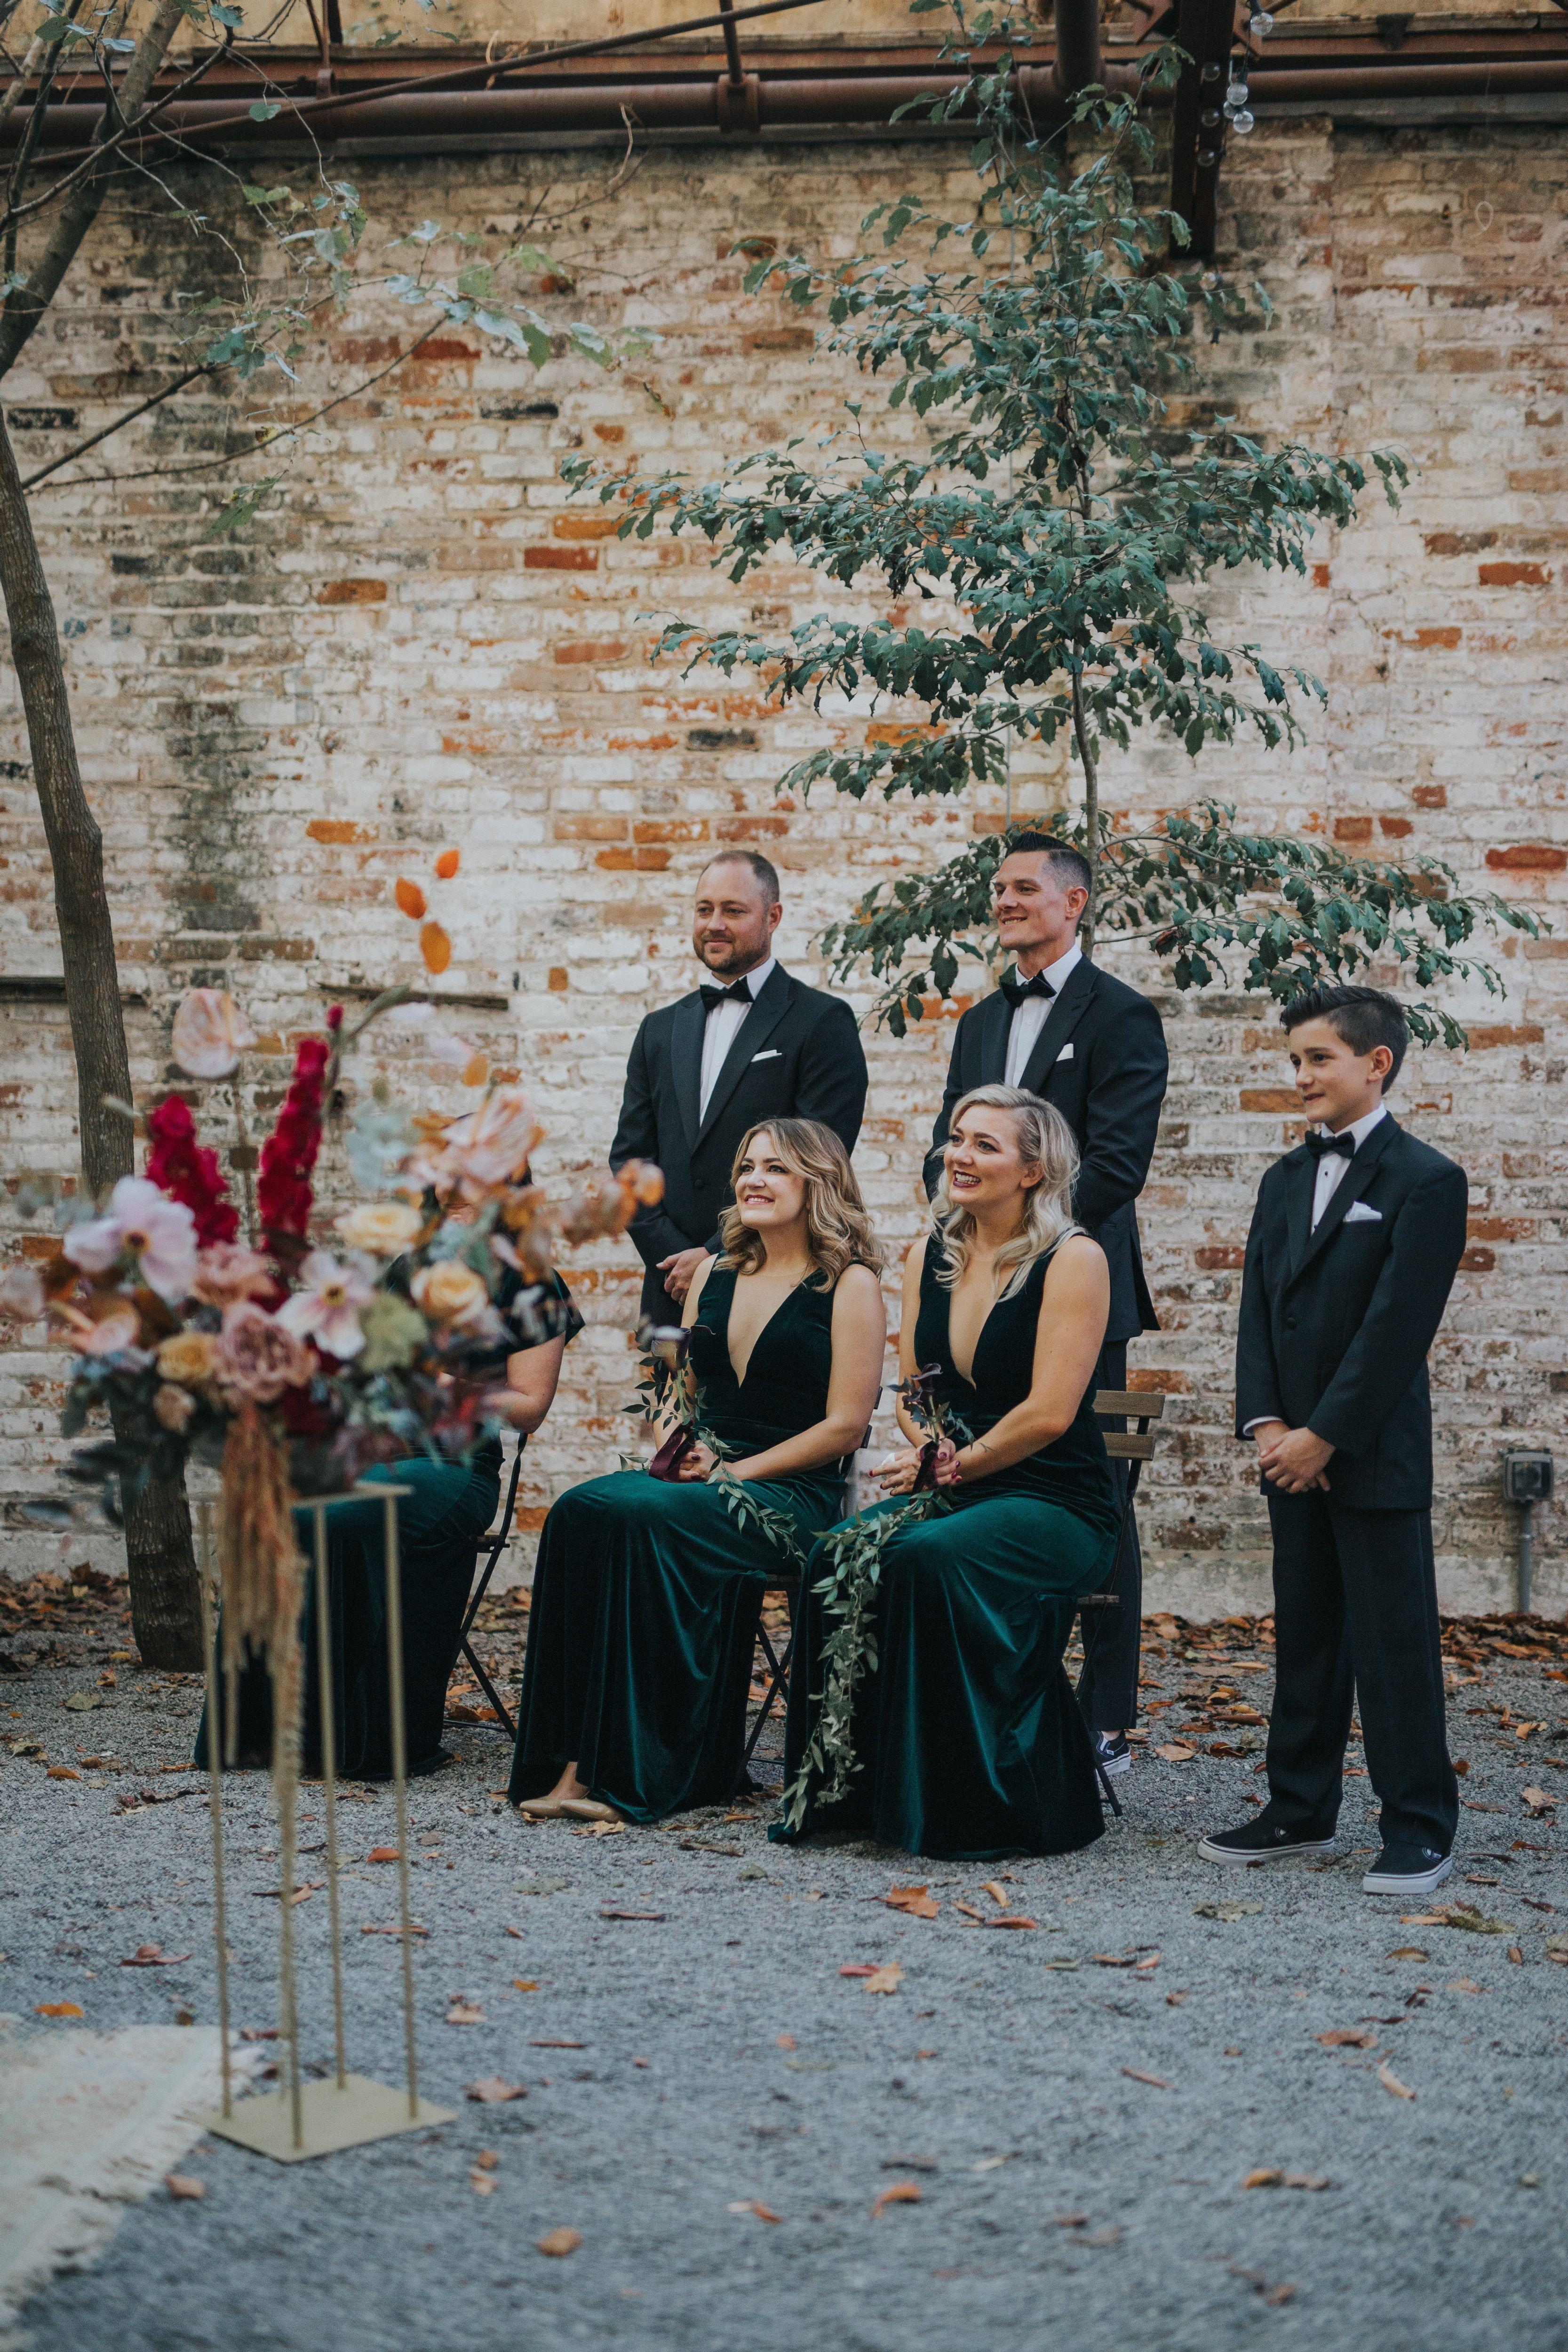 Arts Estuary Ceremony In New Orleans W Lovegood Wedding Event Rentals In 2020 Wedding Events Event Rental Wedding